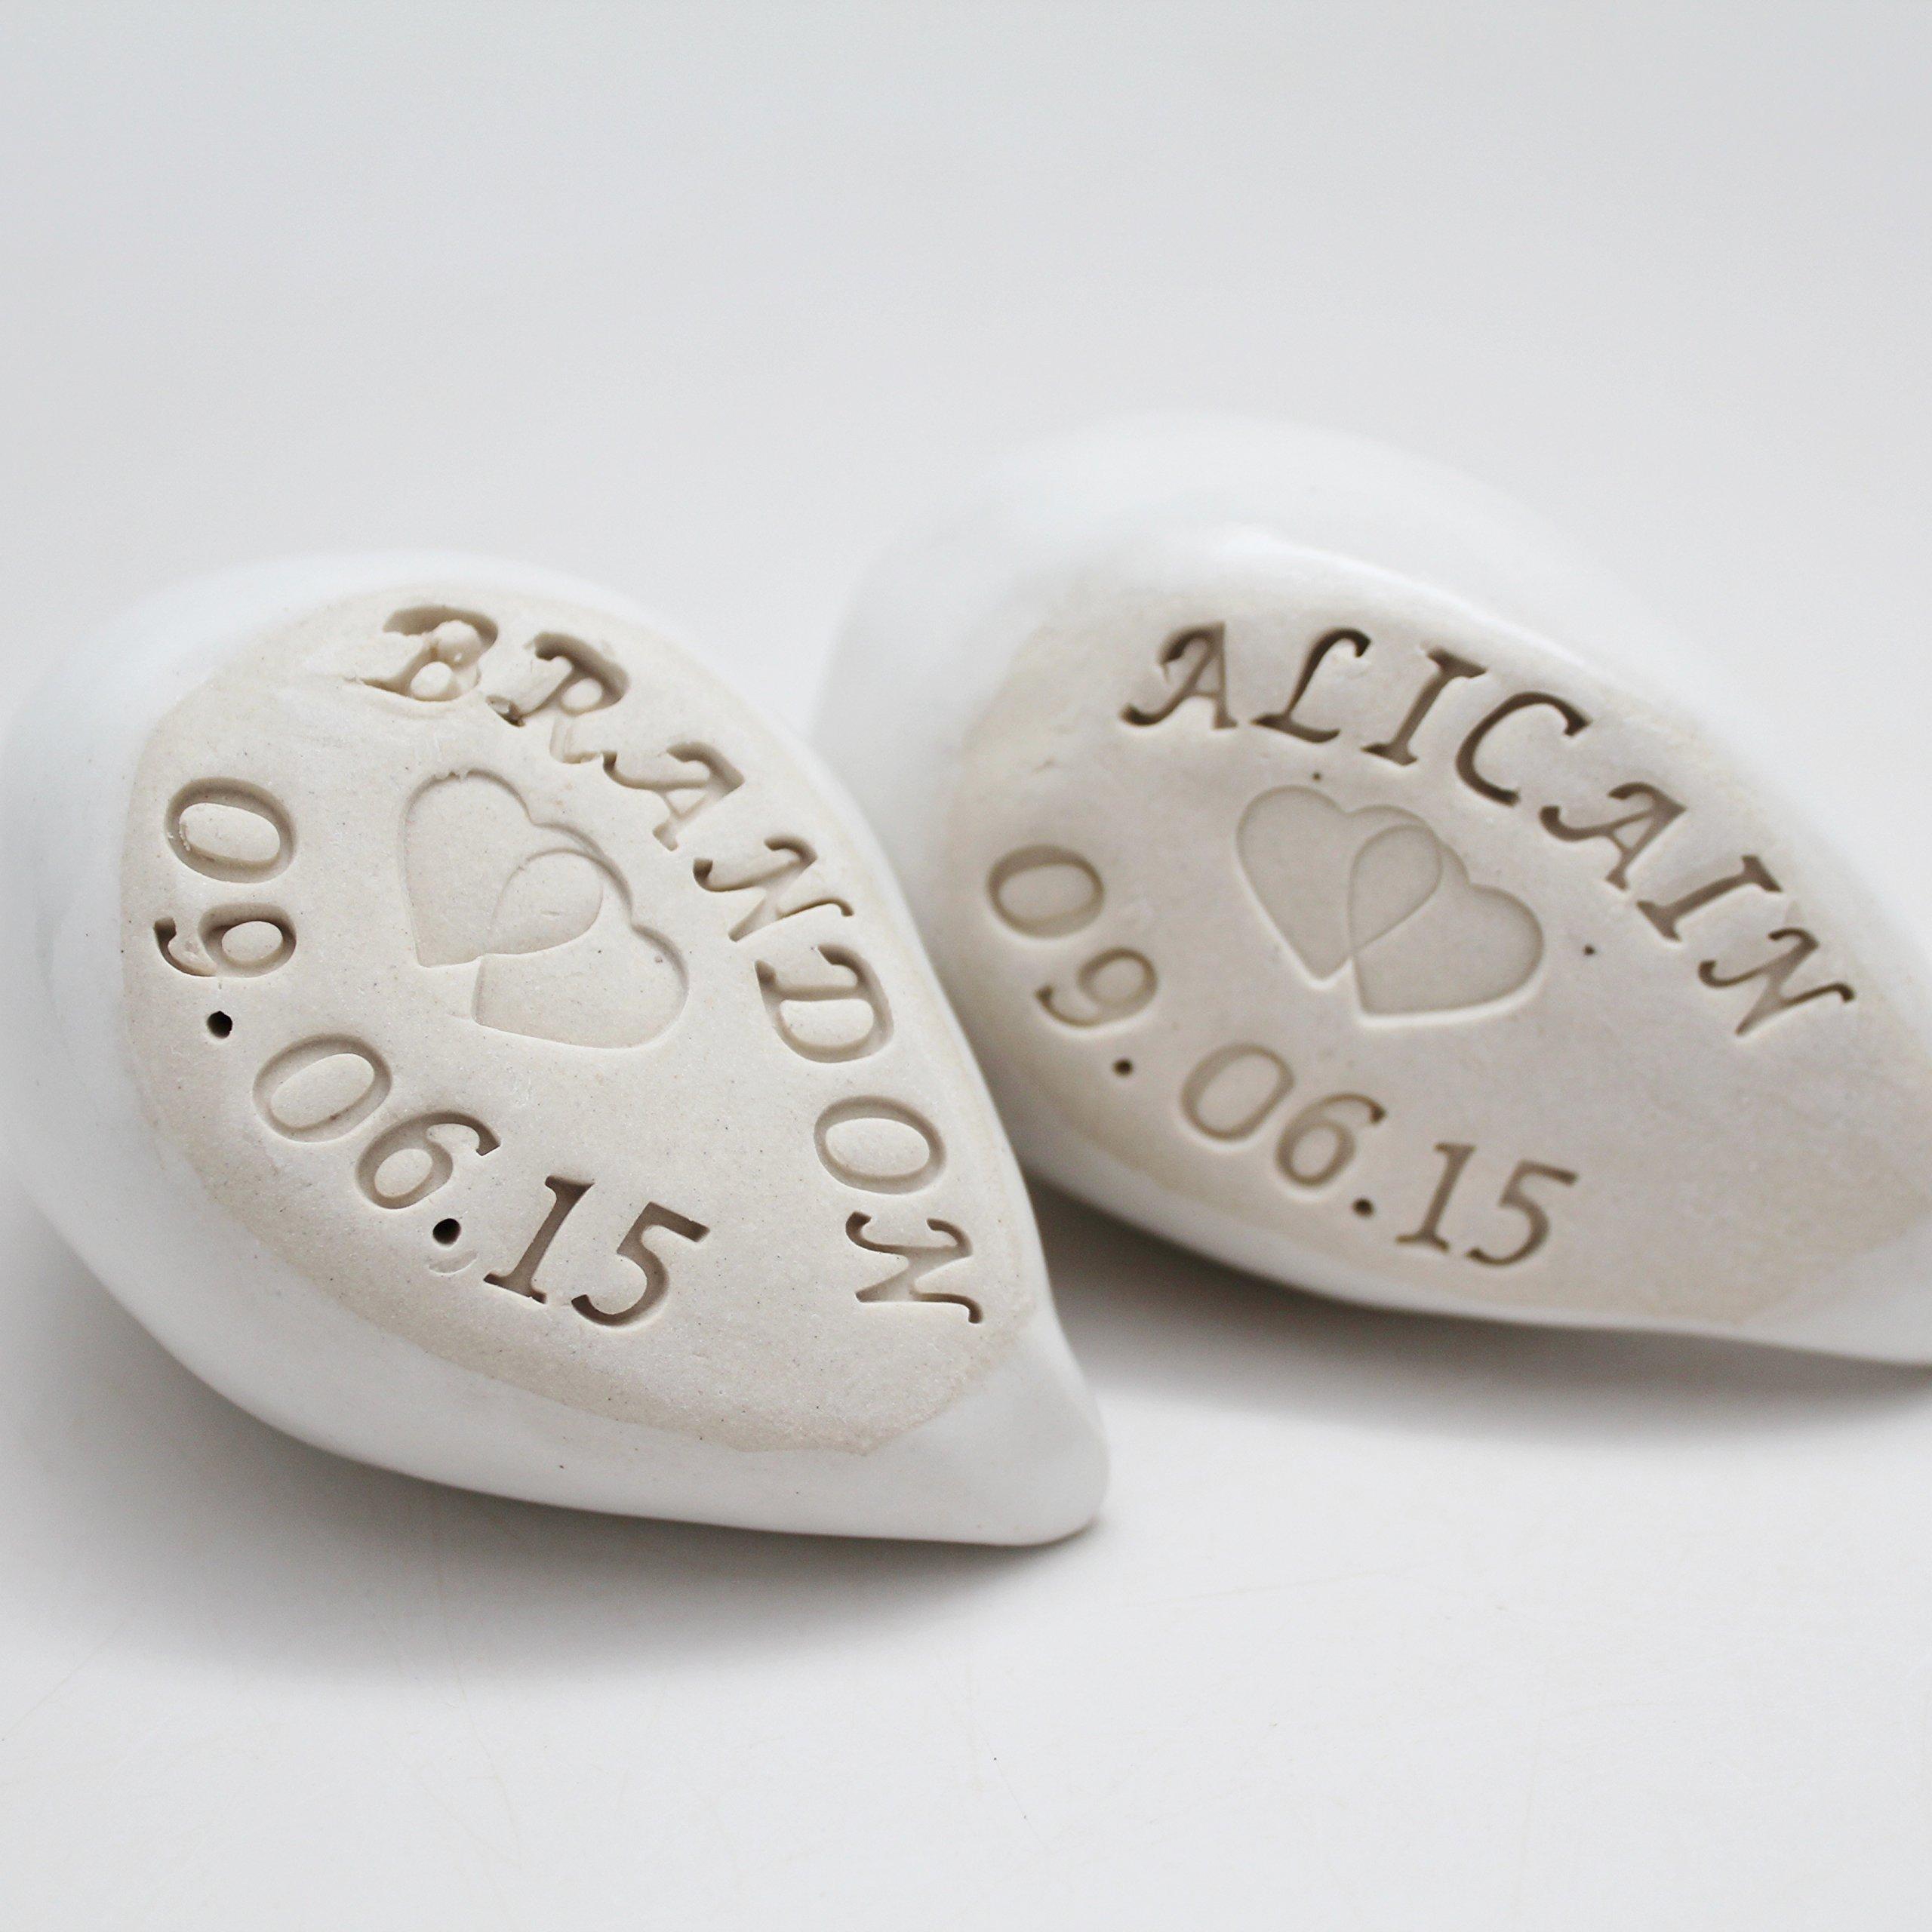 Personalized Porcelain Cake Topper Birds, Anniversary Gift, Handmade Pottery Cake Topper